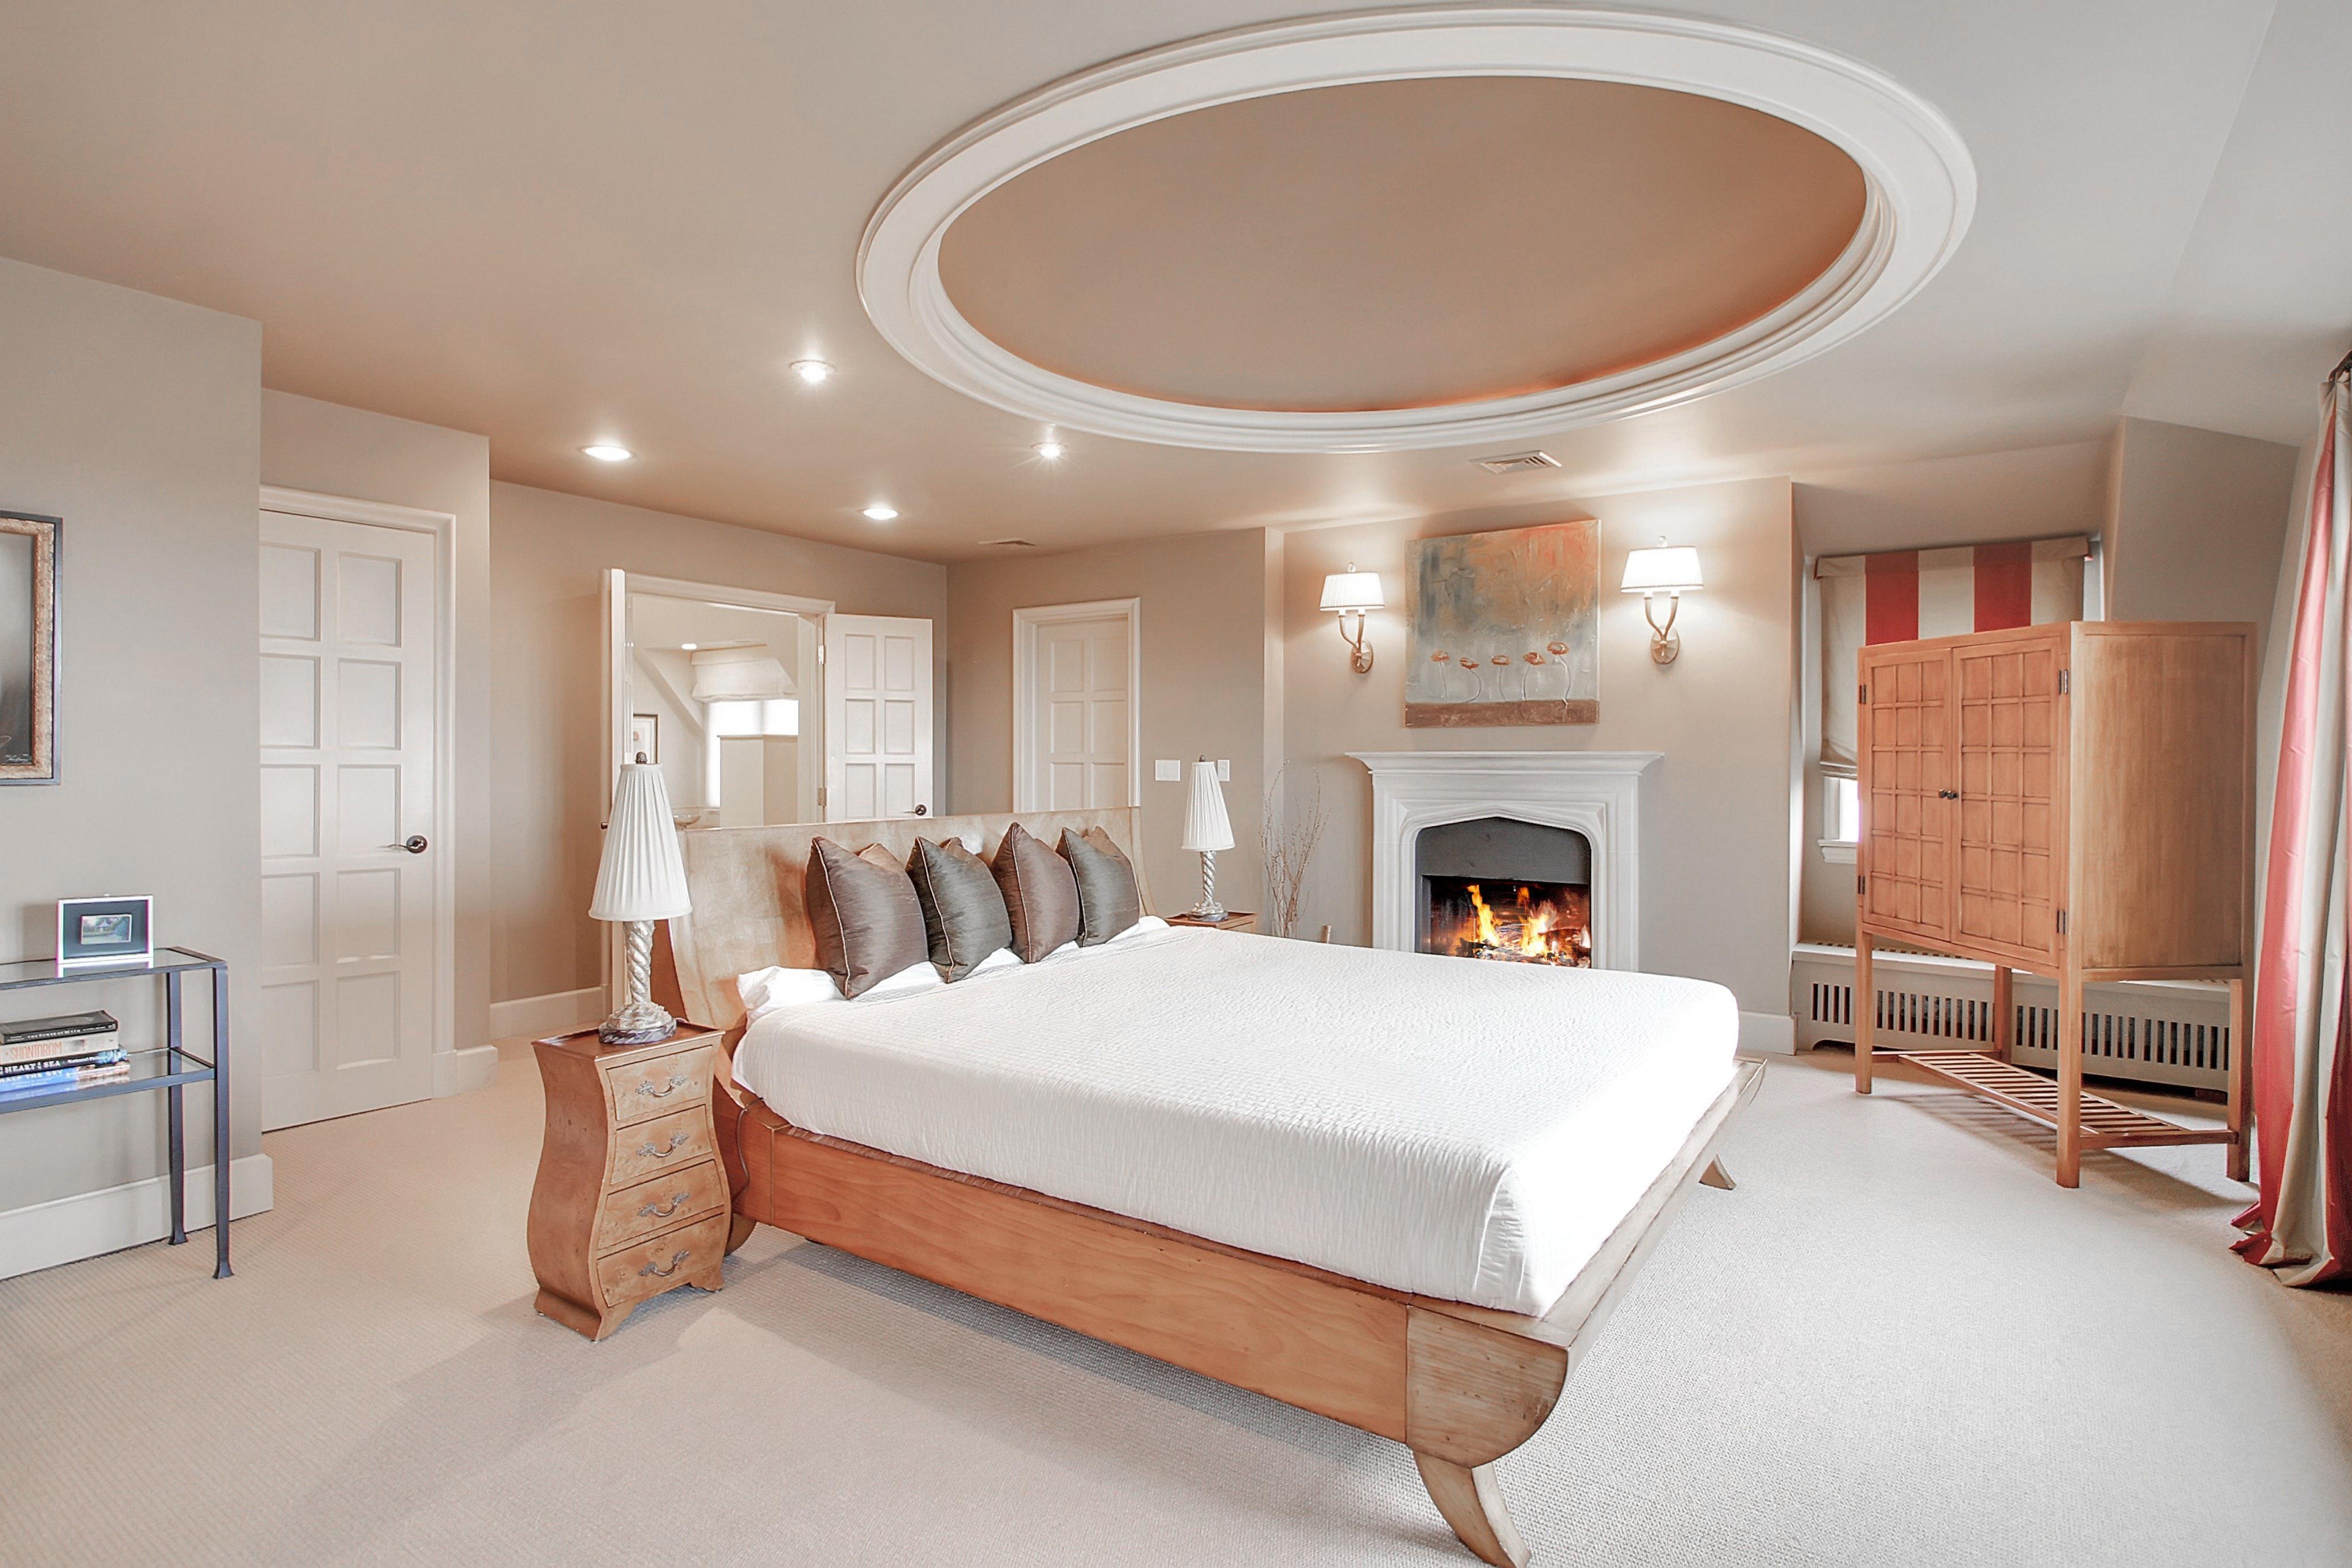 48 Crest Drive Master Bedroom Photo